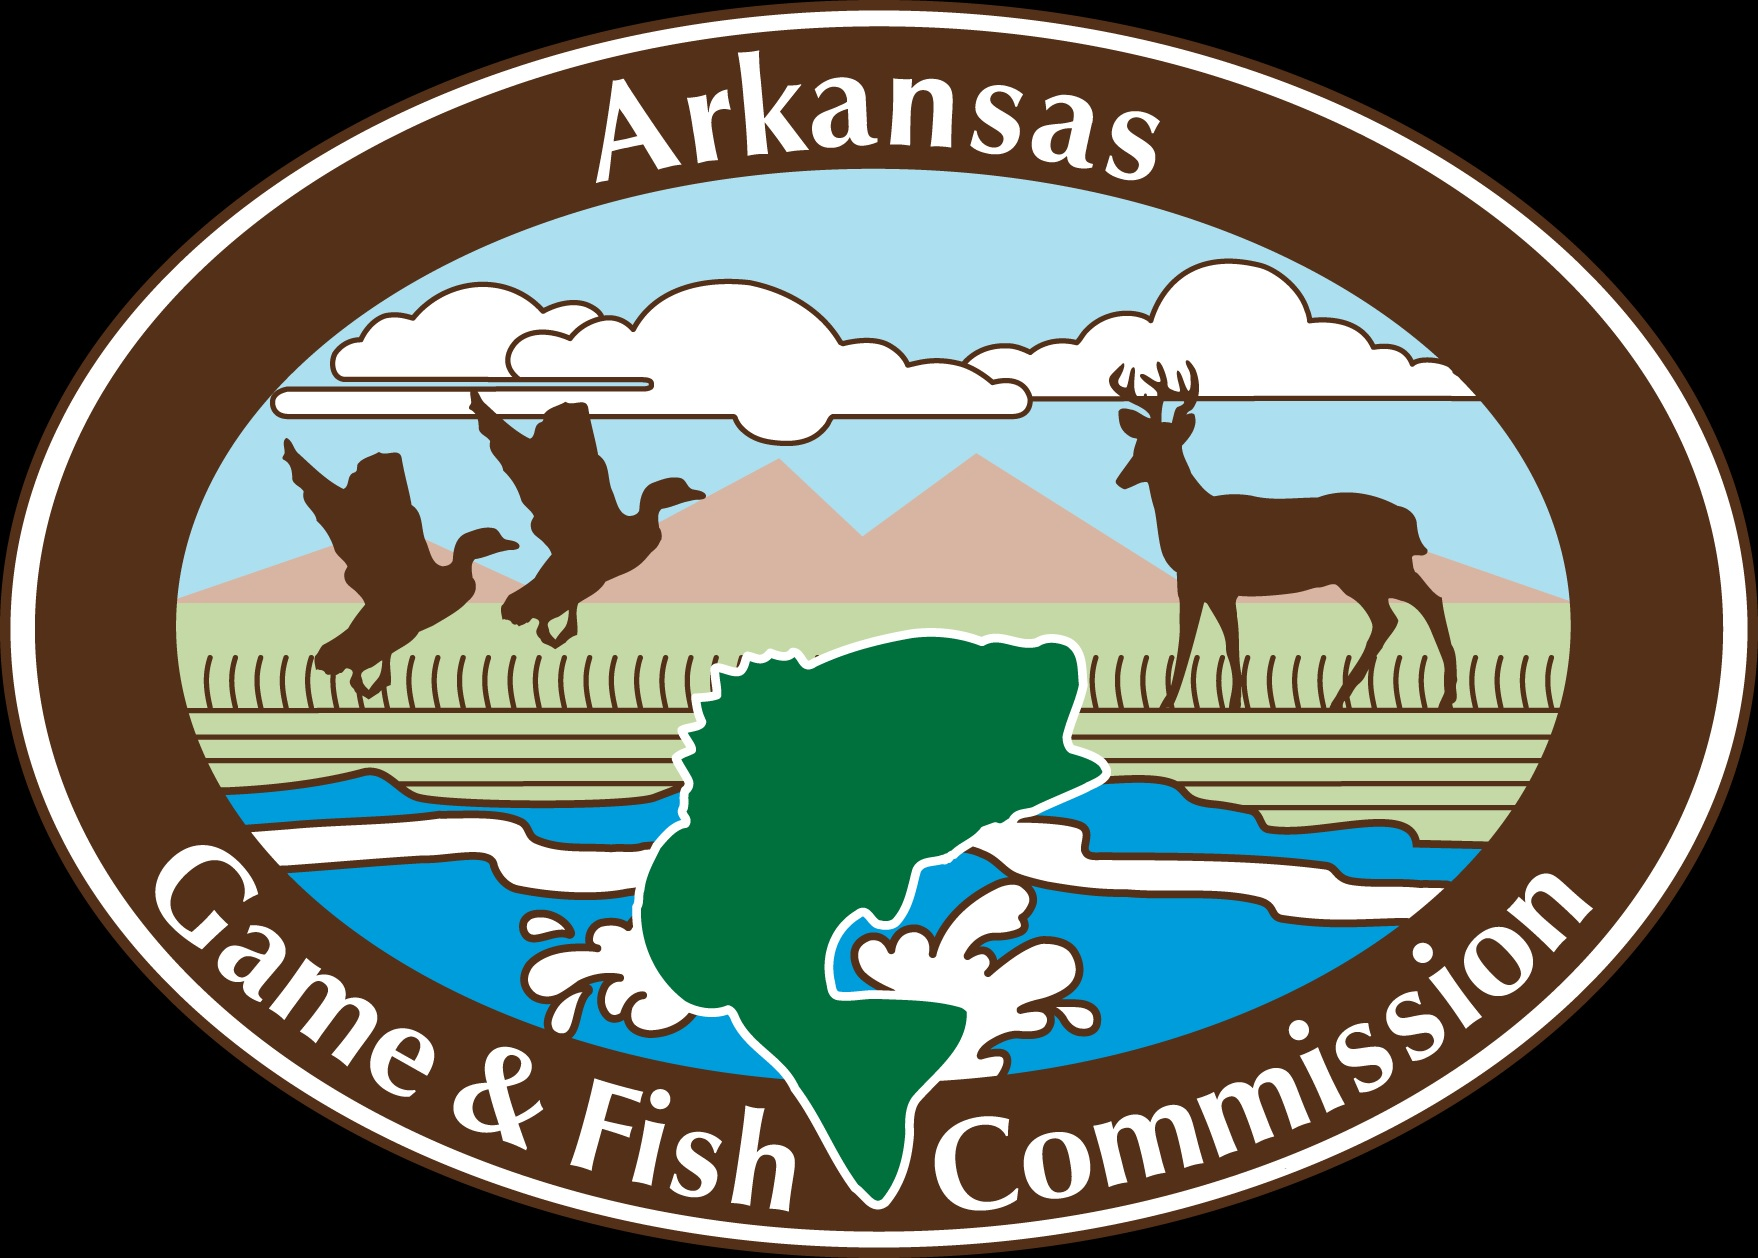 ARKANSAS GAME AND FISH COMMISSION_1534434781395.jpg.jpg